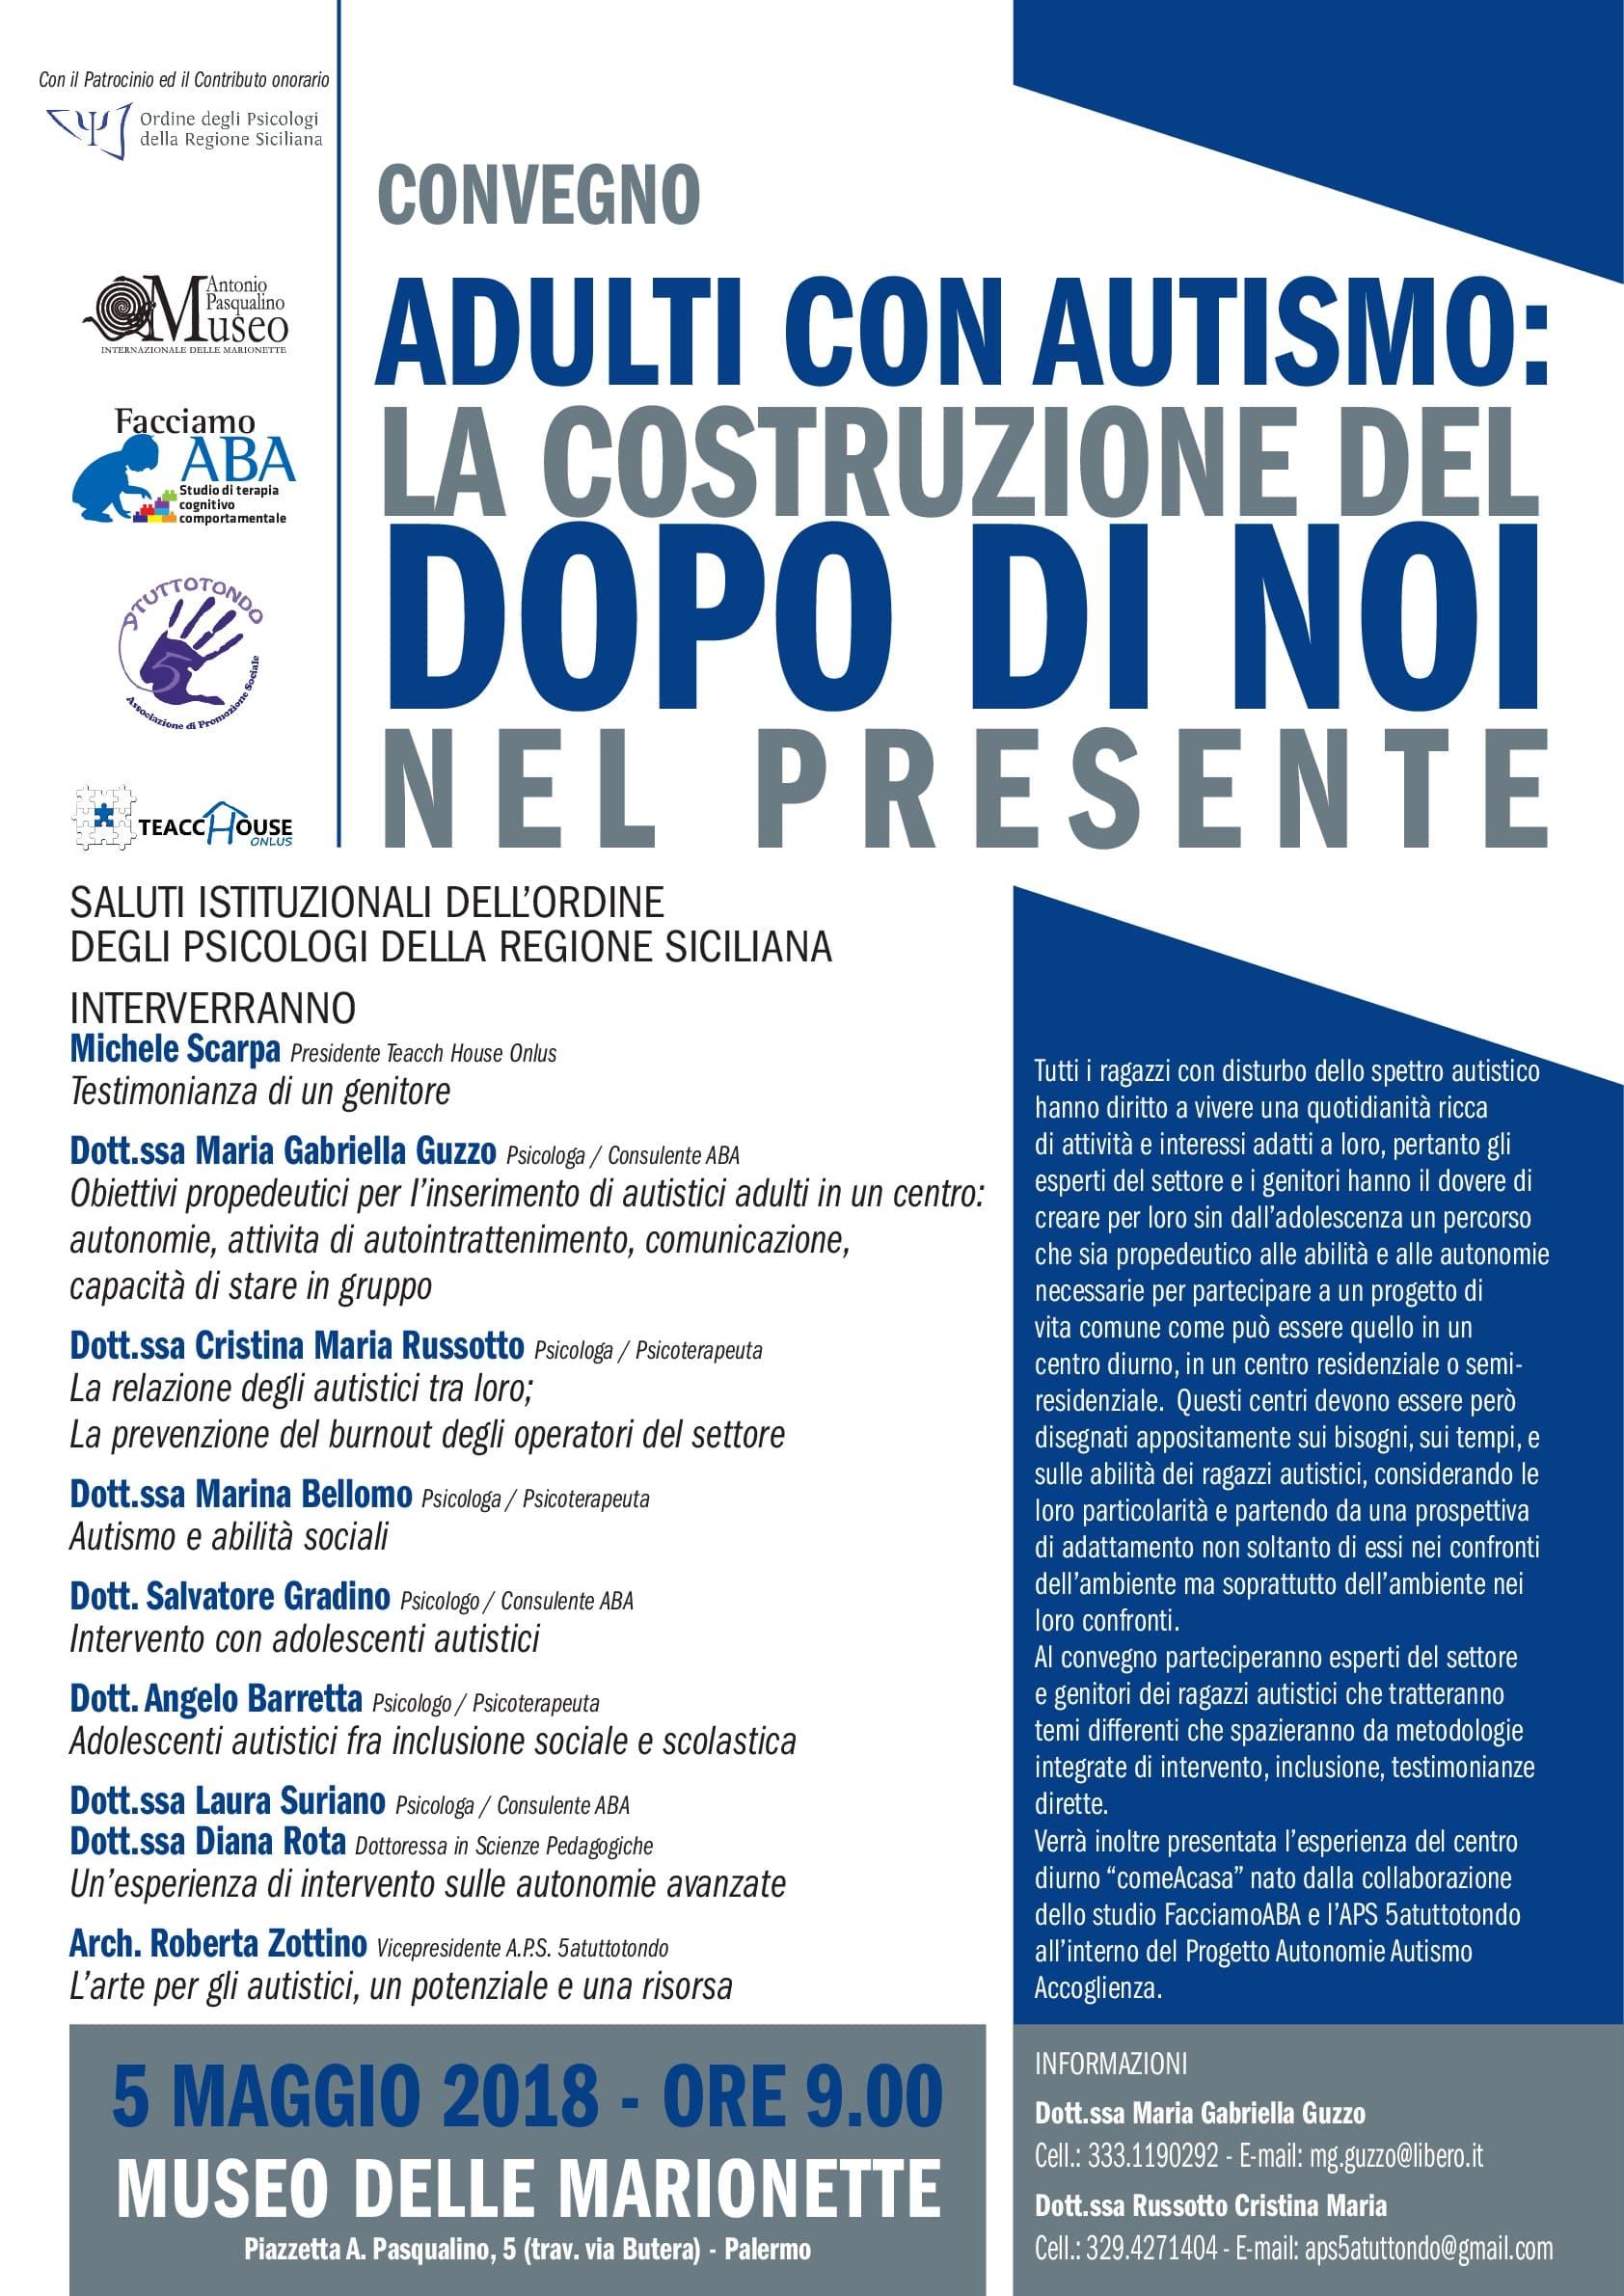 Locandina_Convegno_Autismo_A3-001-min.jpg - 405.94 kB